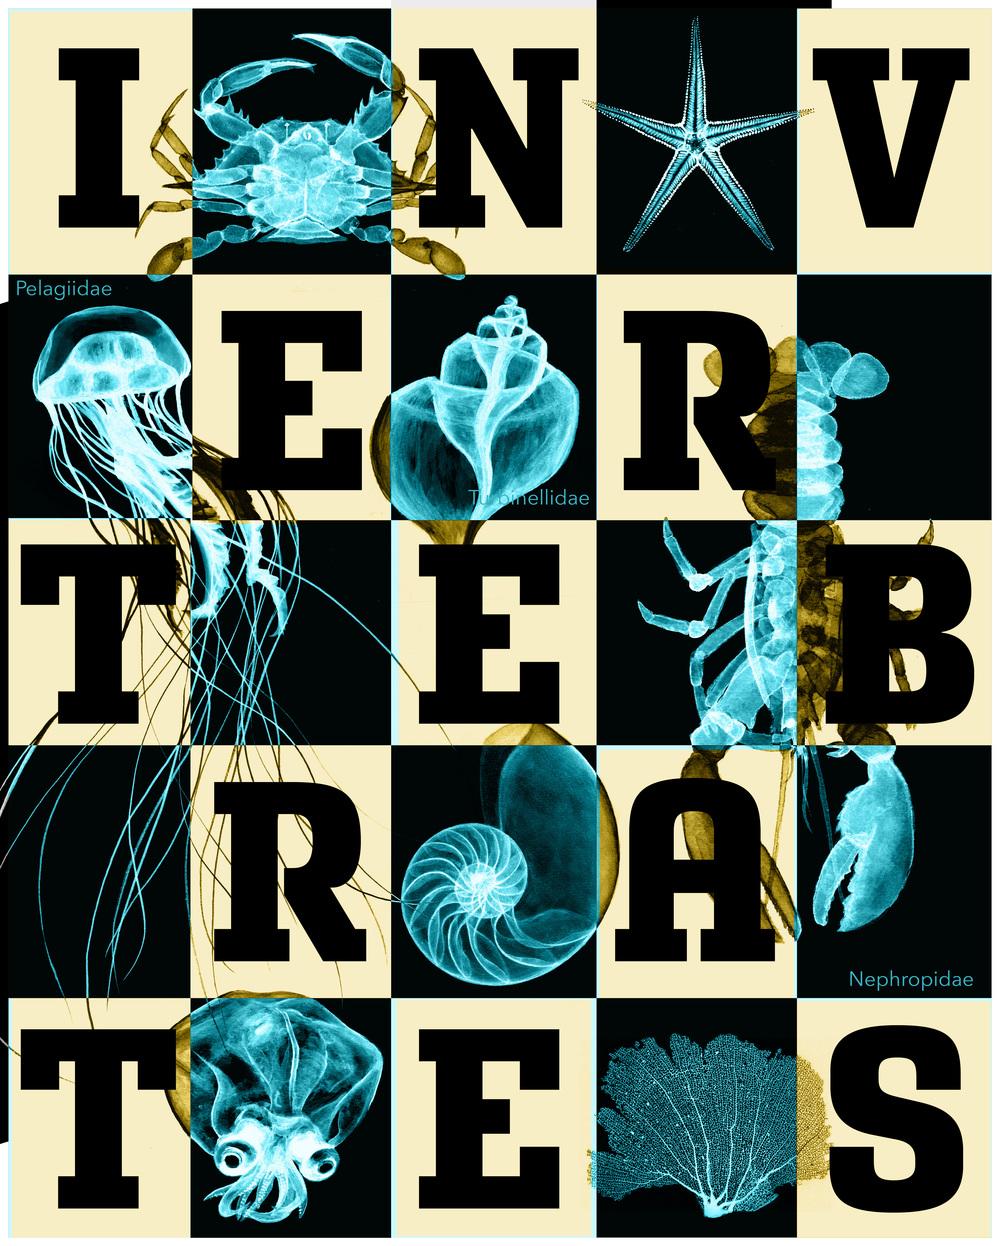 invertebrates5-01.jpg